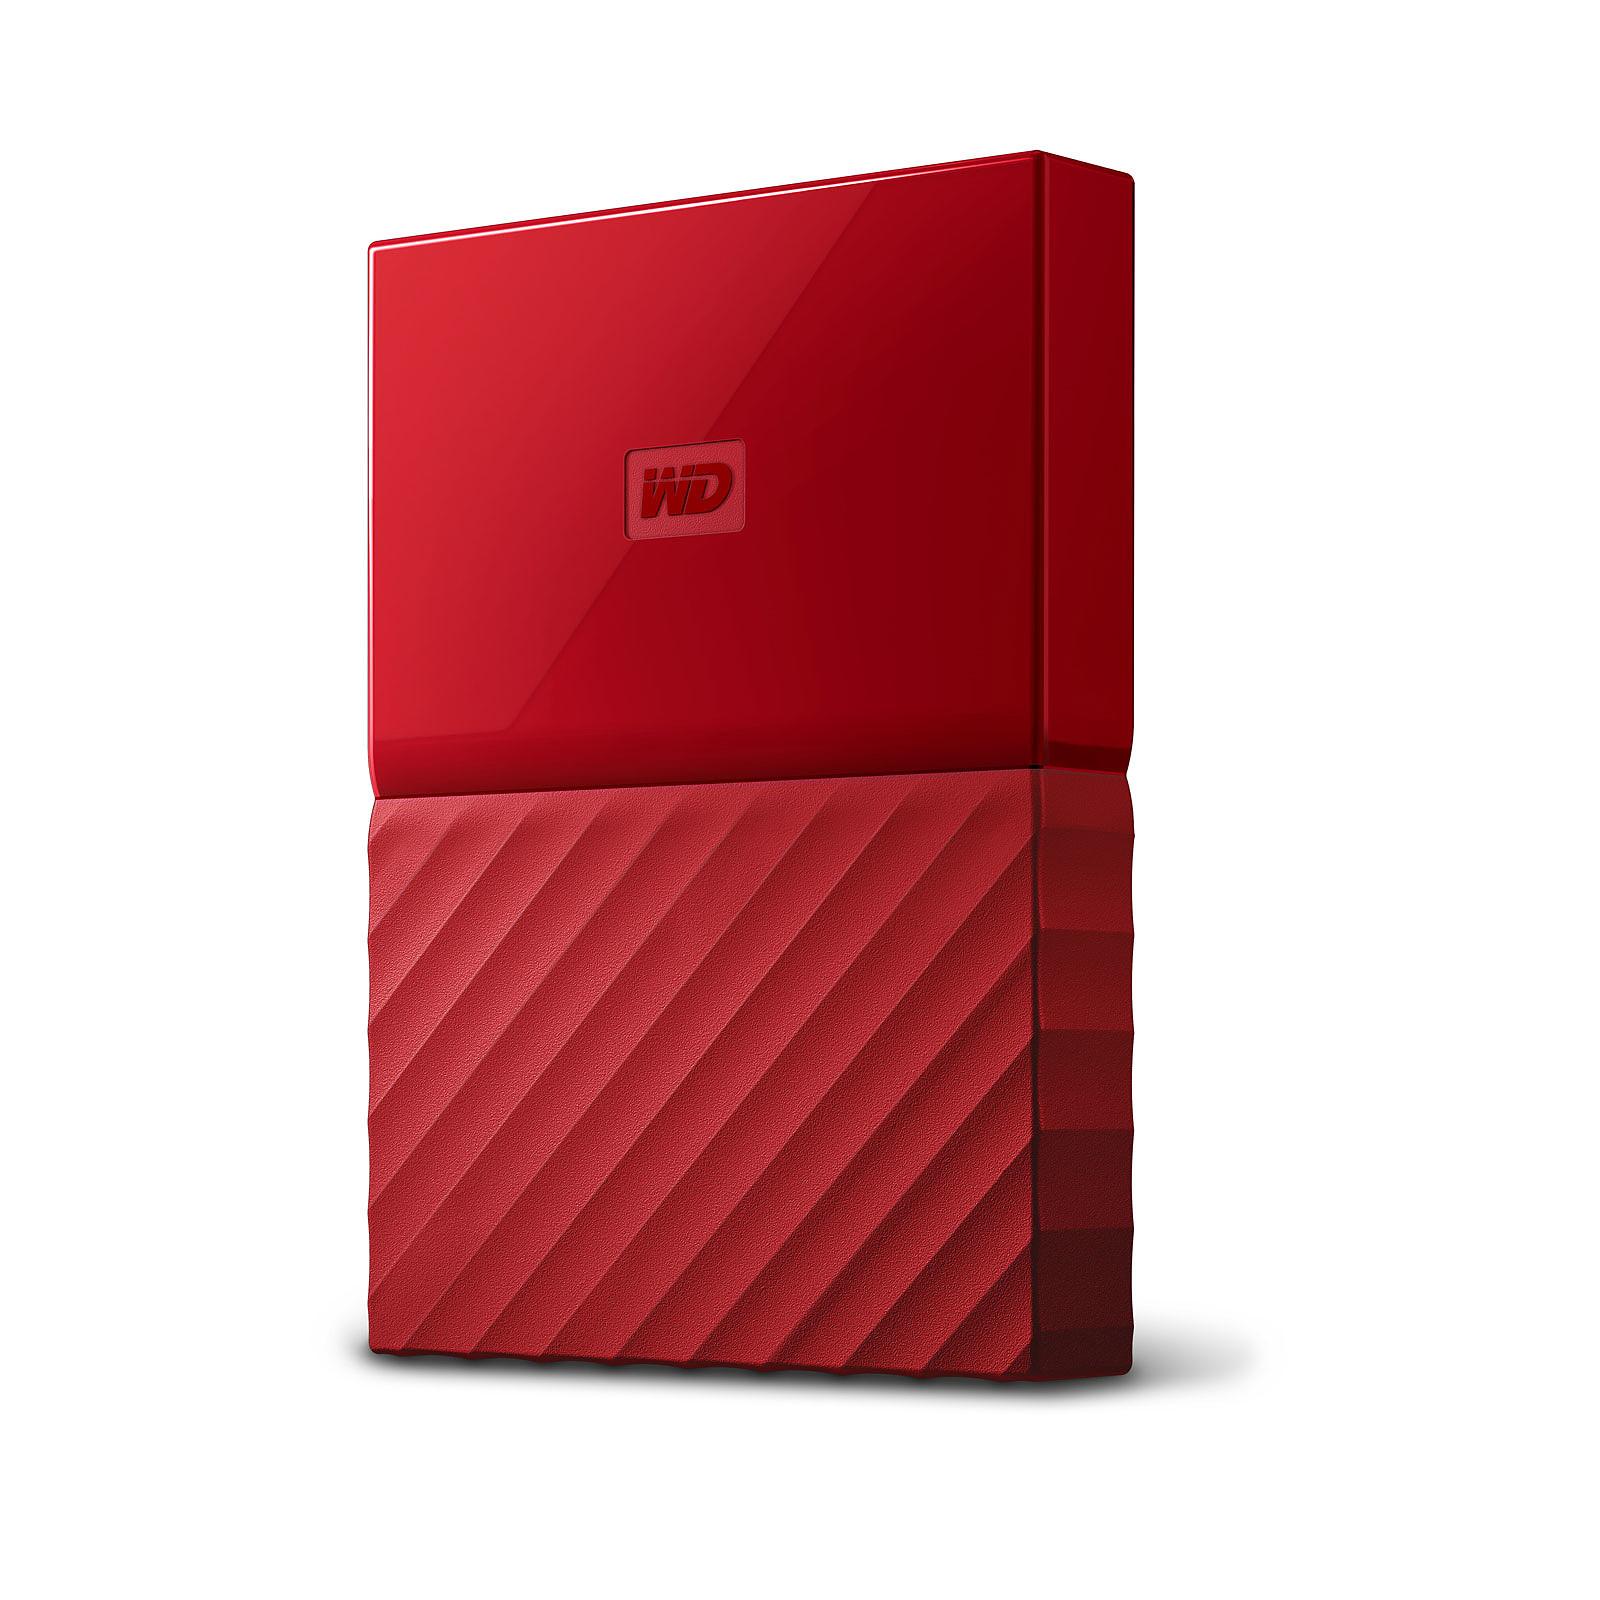 WD My Passport Thin 2 To Rouge (USB 3.0)